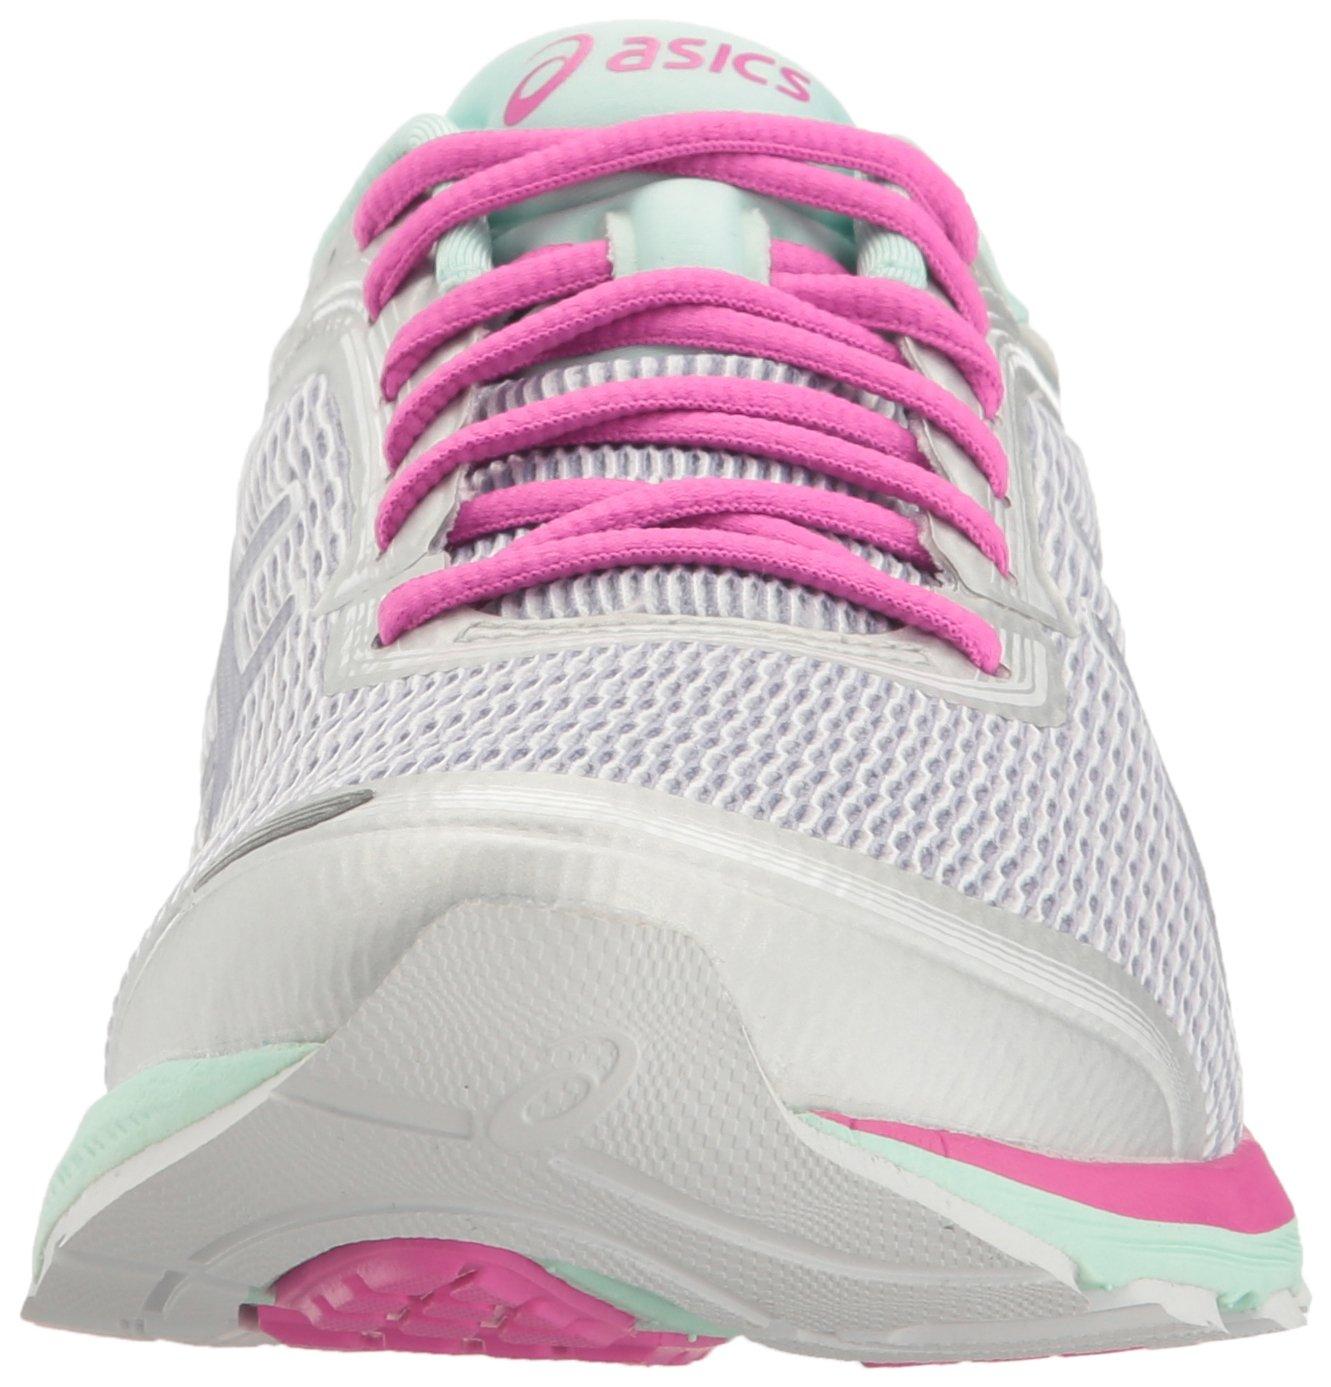 ASICS Women's Dynaflyte B(M) Running Shoe B01GSTJ28M 9 B(M) Dynaflyte US|White/Pink Glow/Silver 0e58c4